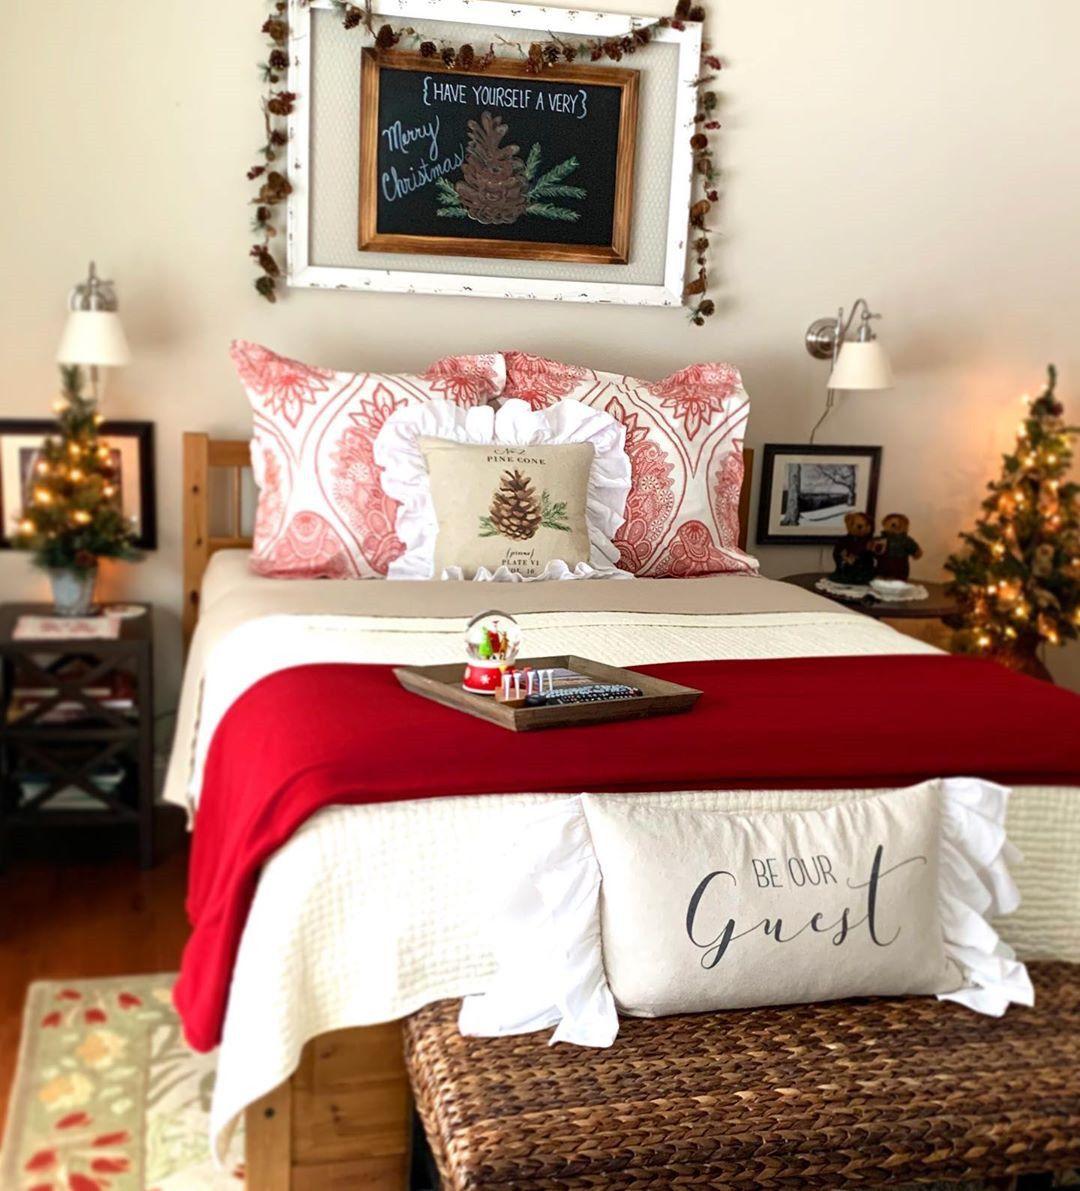 56 Best Christmas Bedroom Decor Ideas For A Positively Jolly Night Sleep Christmas Decorations Bedroom Bedroom Decor Christmas Bedroom